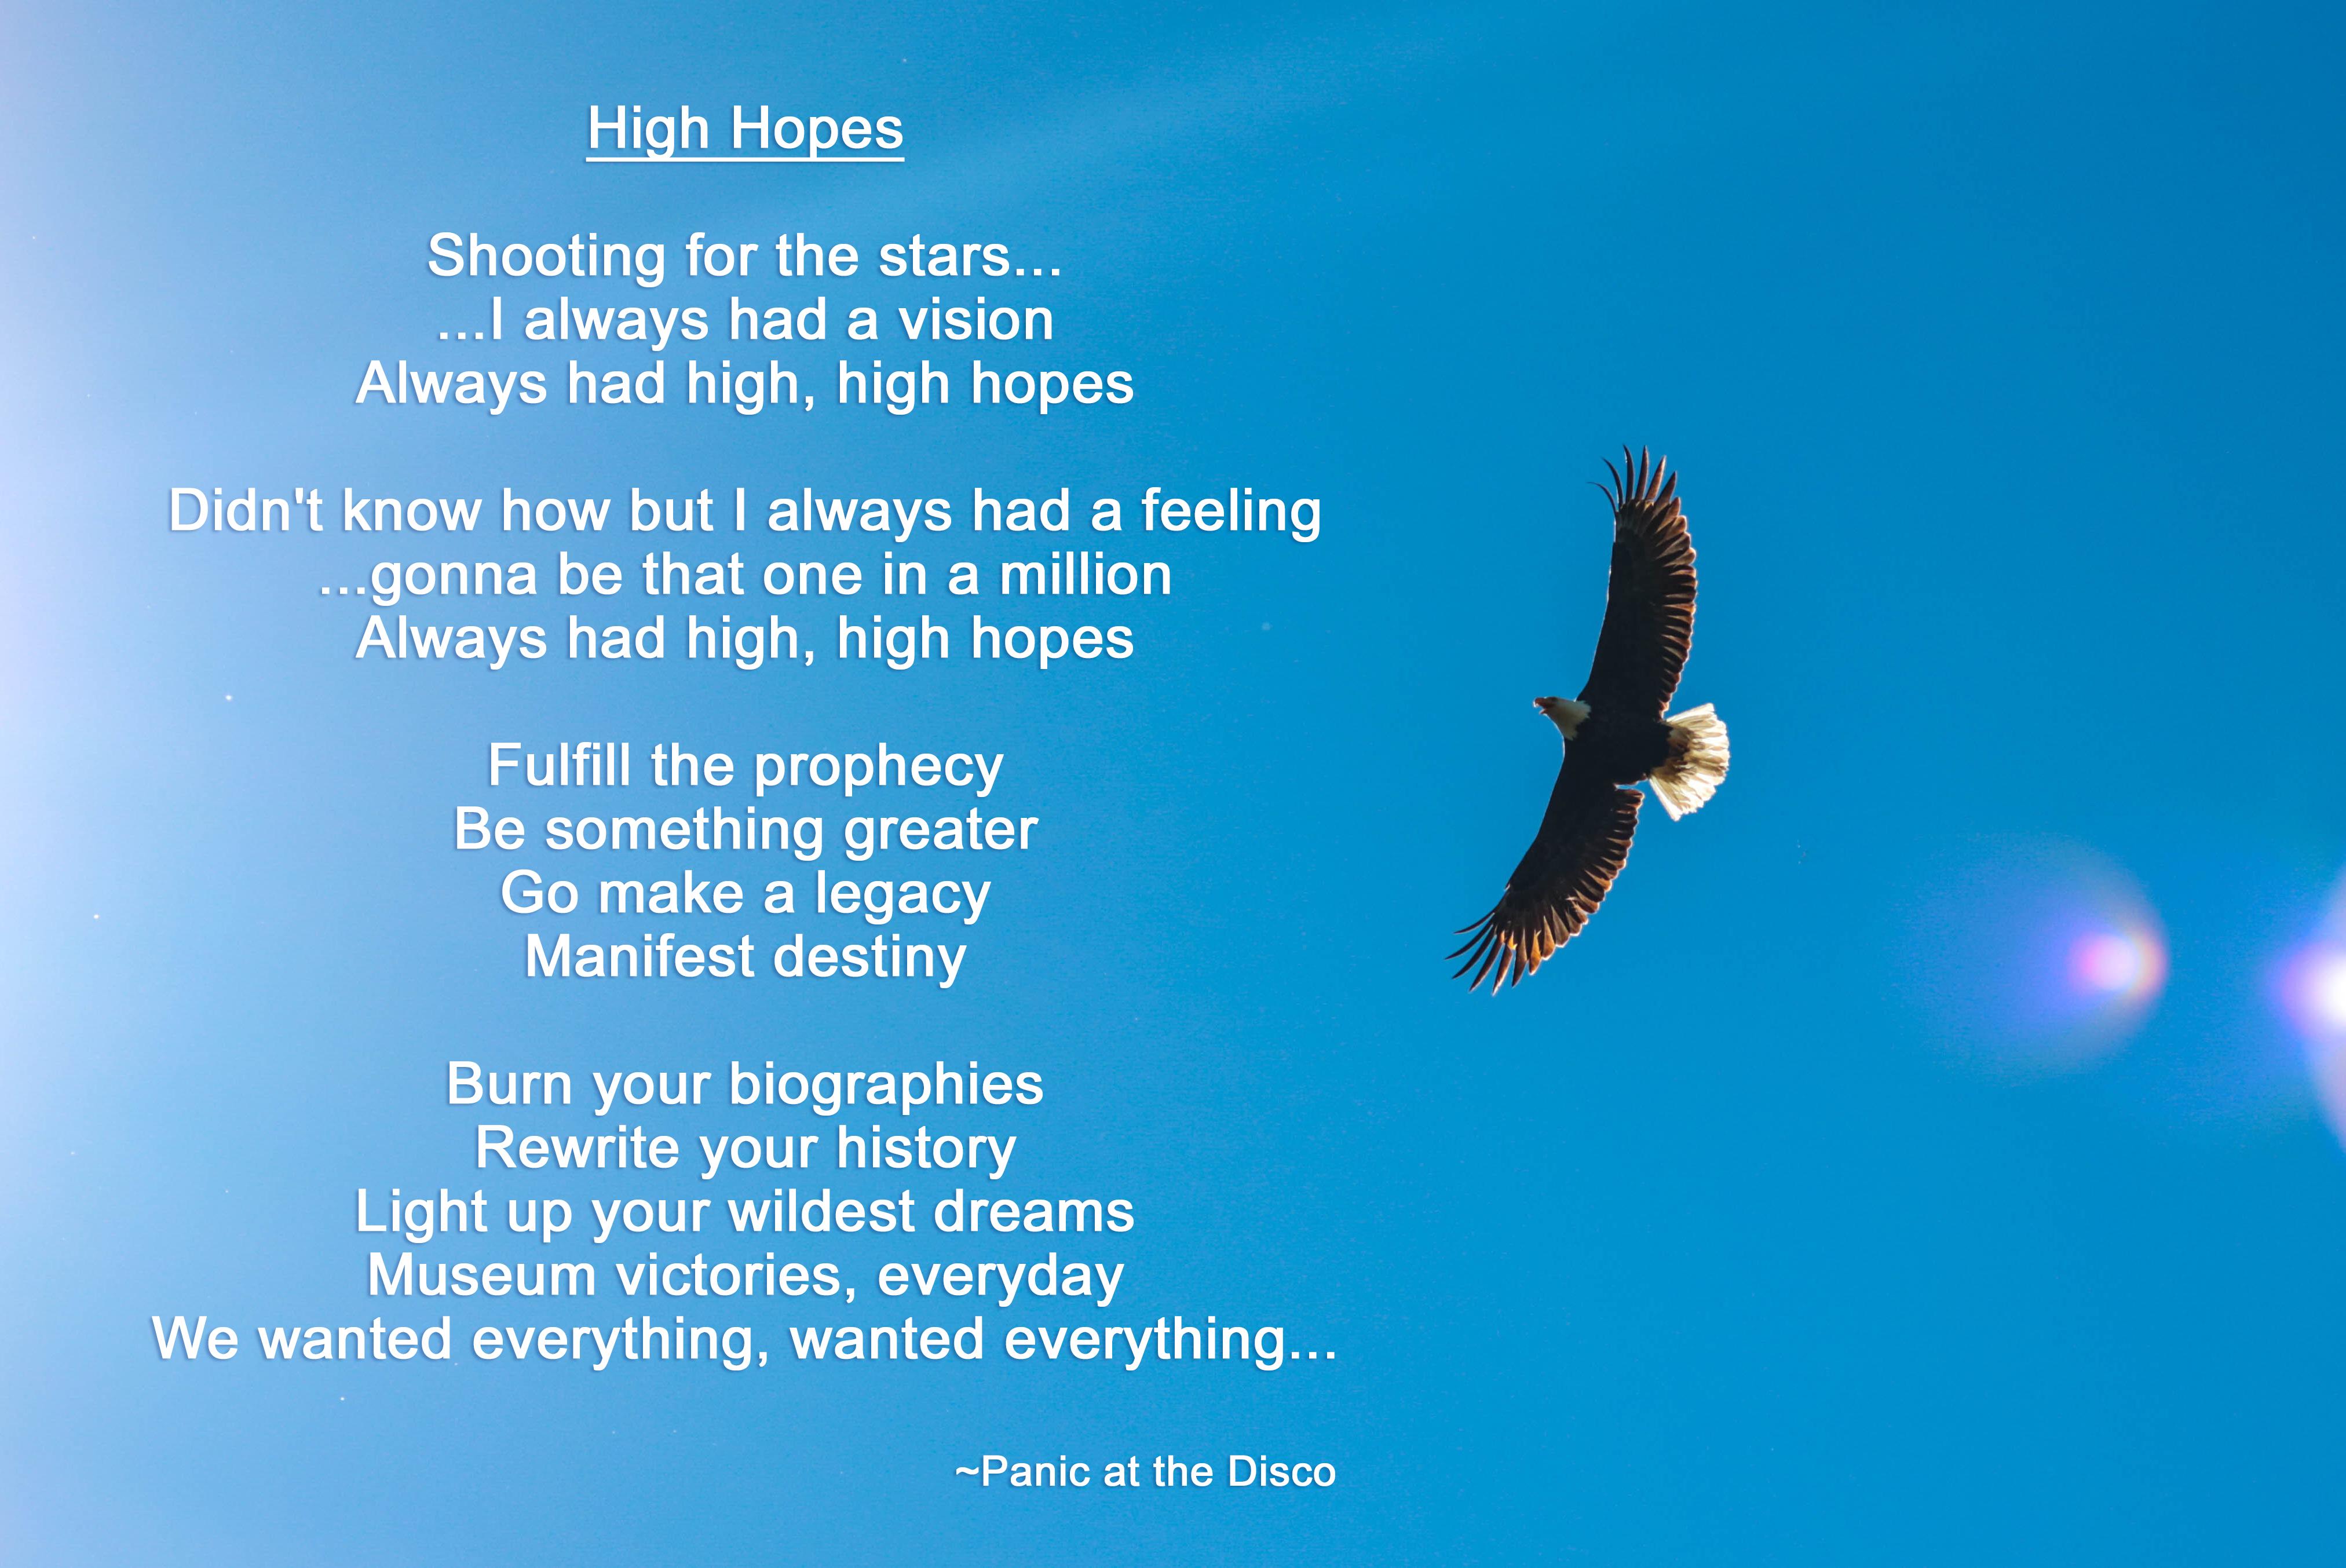 2019 Video - High Hopes Image